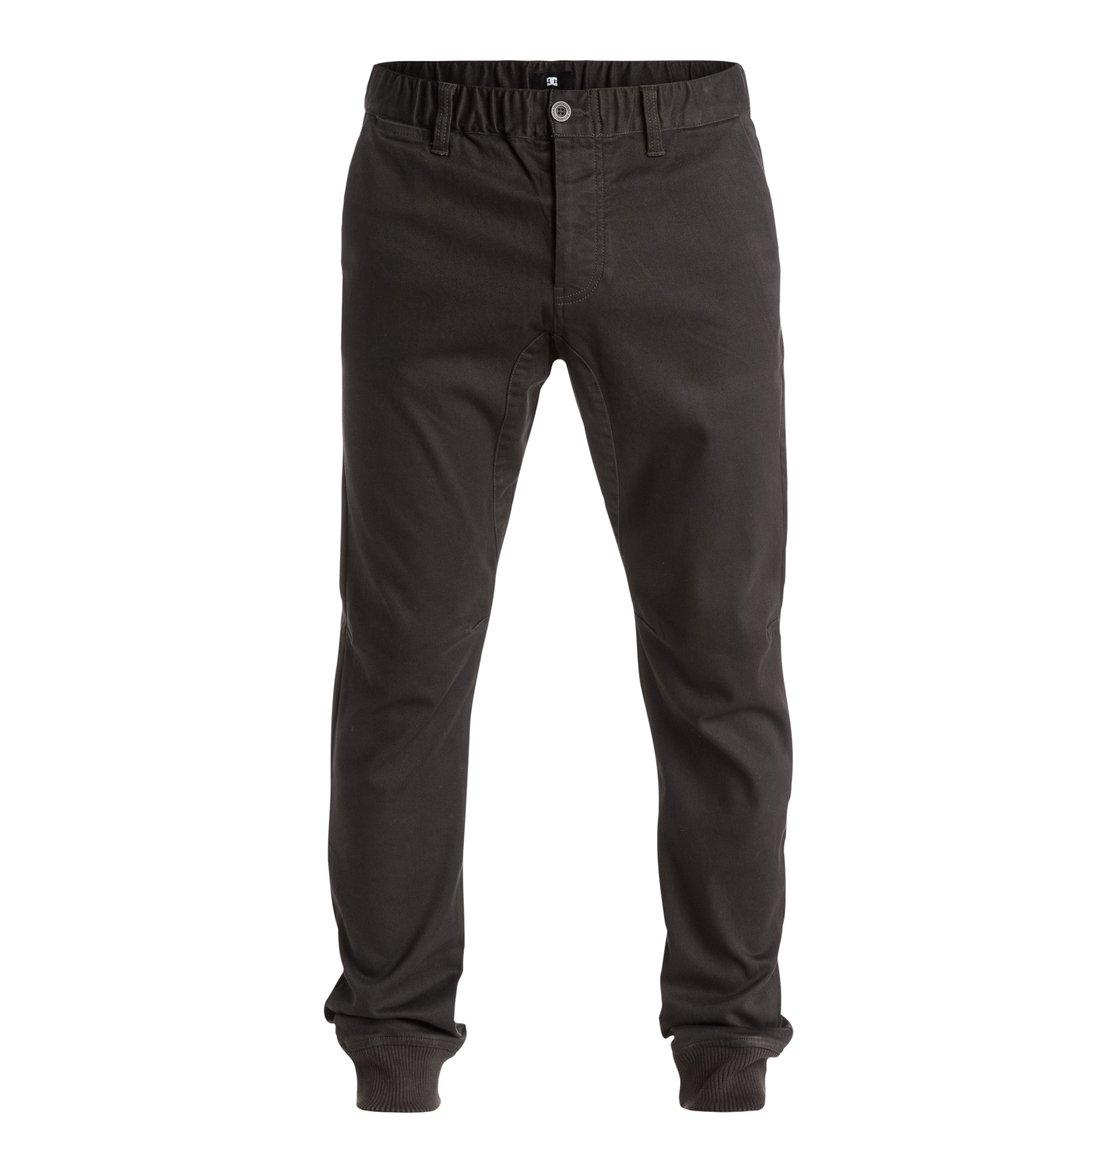 Otterburn - Pantalón De Chandal De Twill para Hombre - Roxy